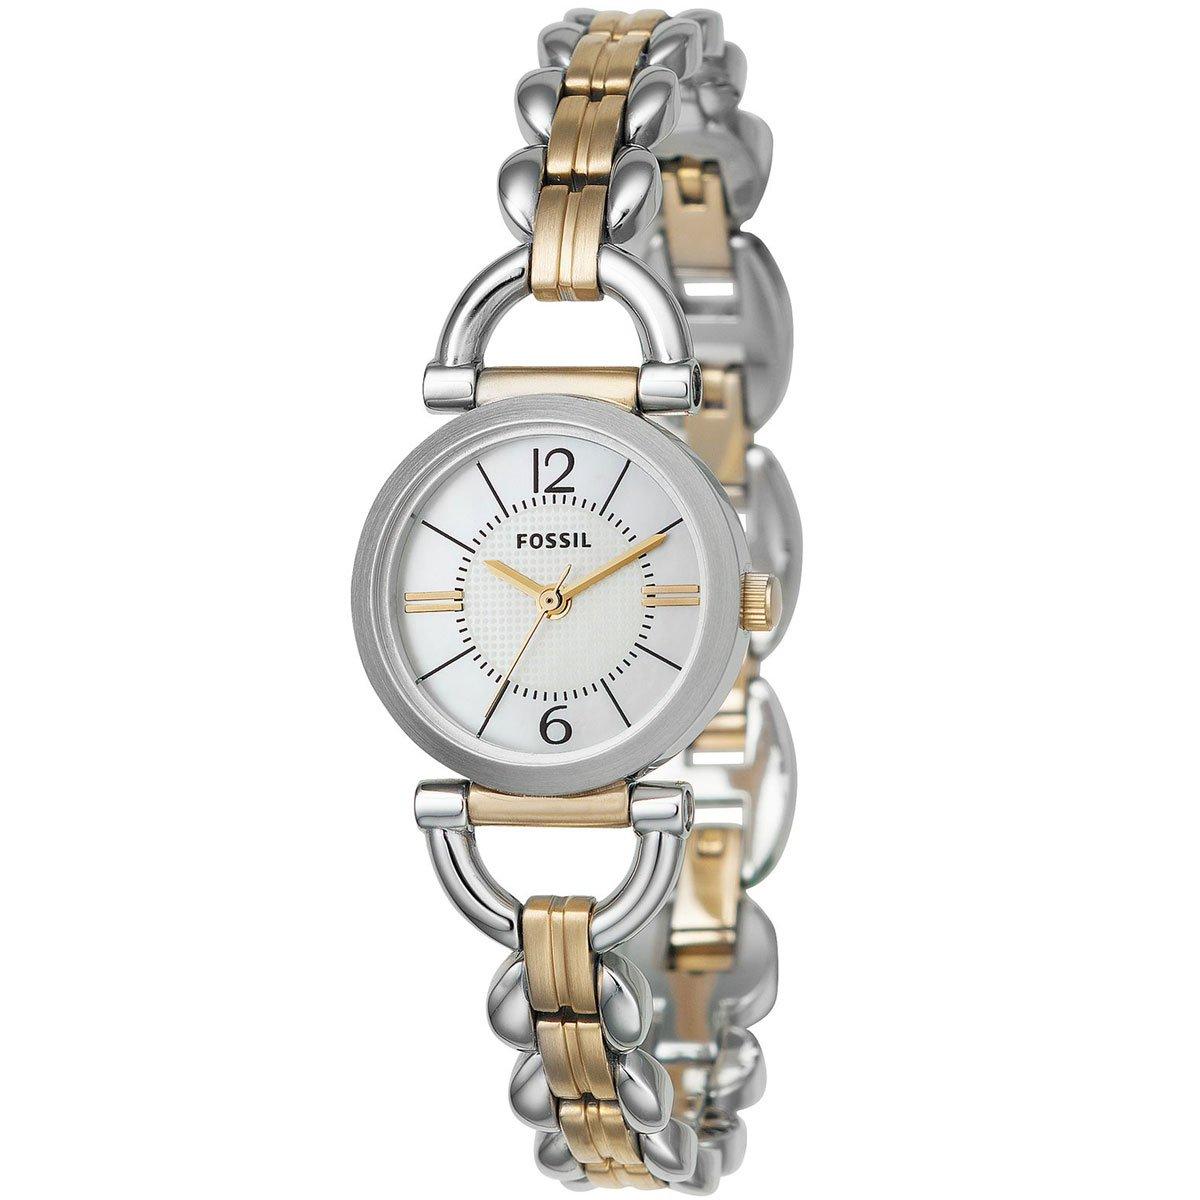 Fossil Womens Quartz Stainless Steel Dress Watch Color Es3380 Original Boyfriend Chronograph Rose Tone Colorsilver Toned Model Es2494 Watches